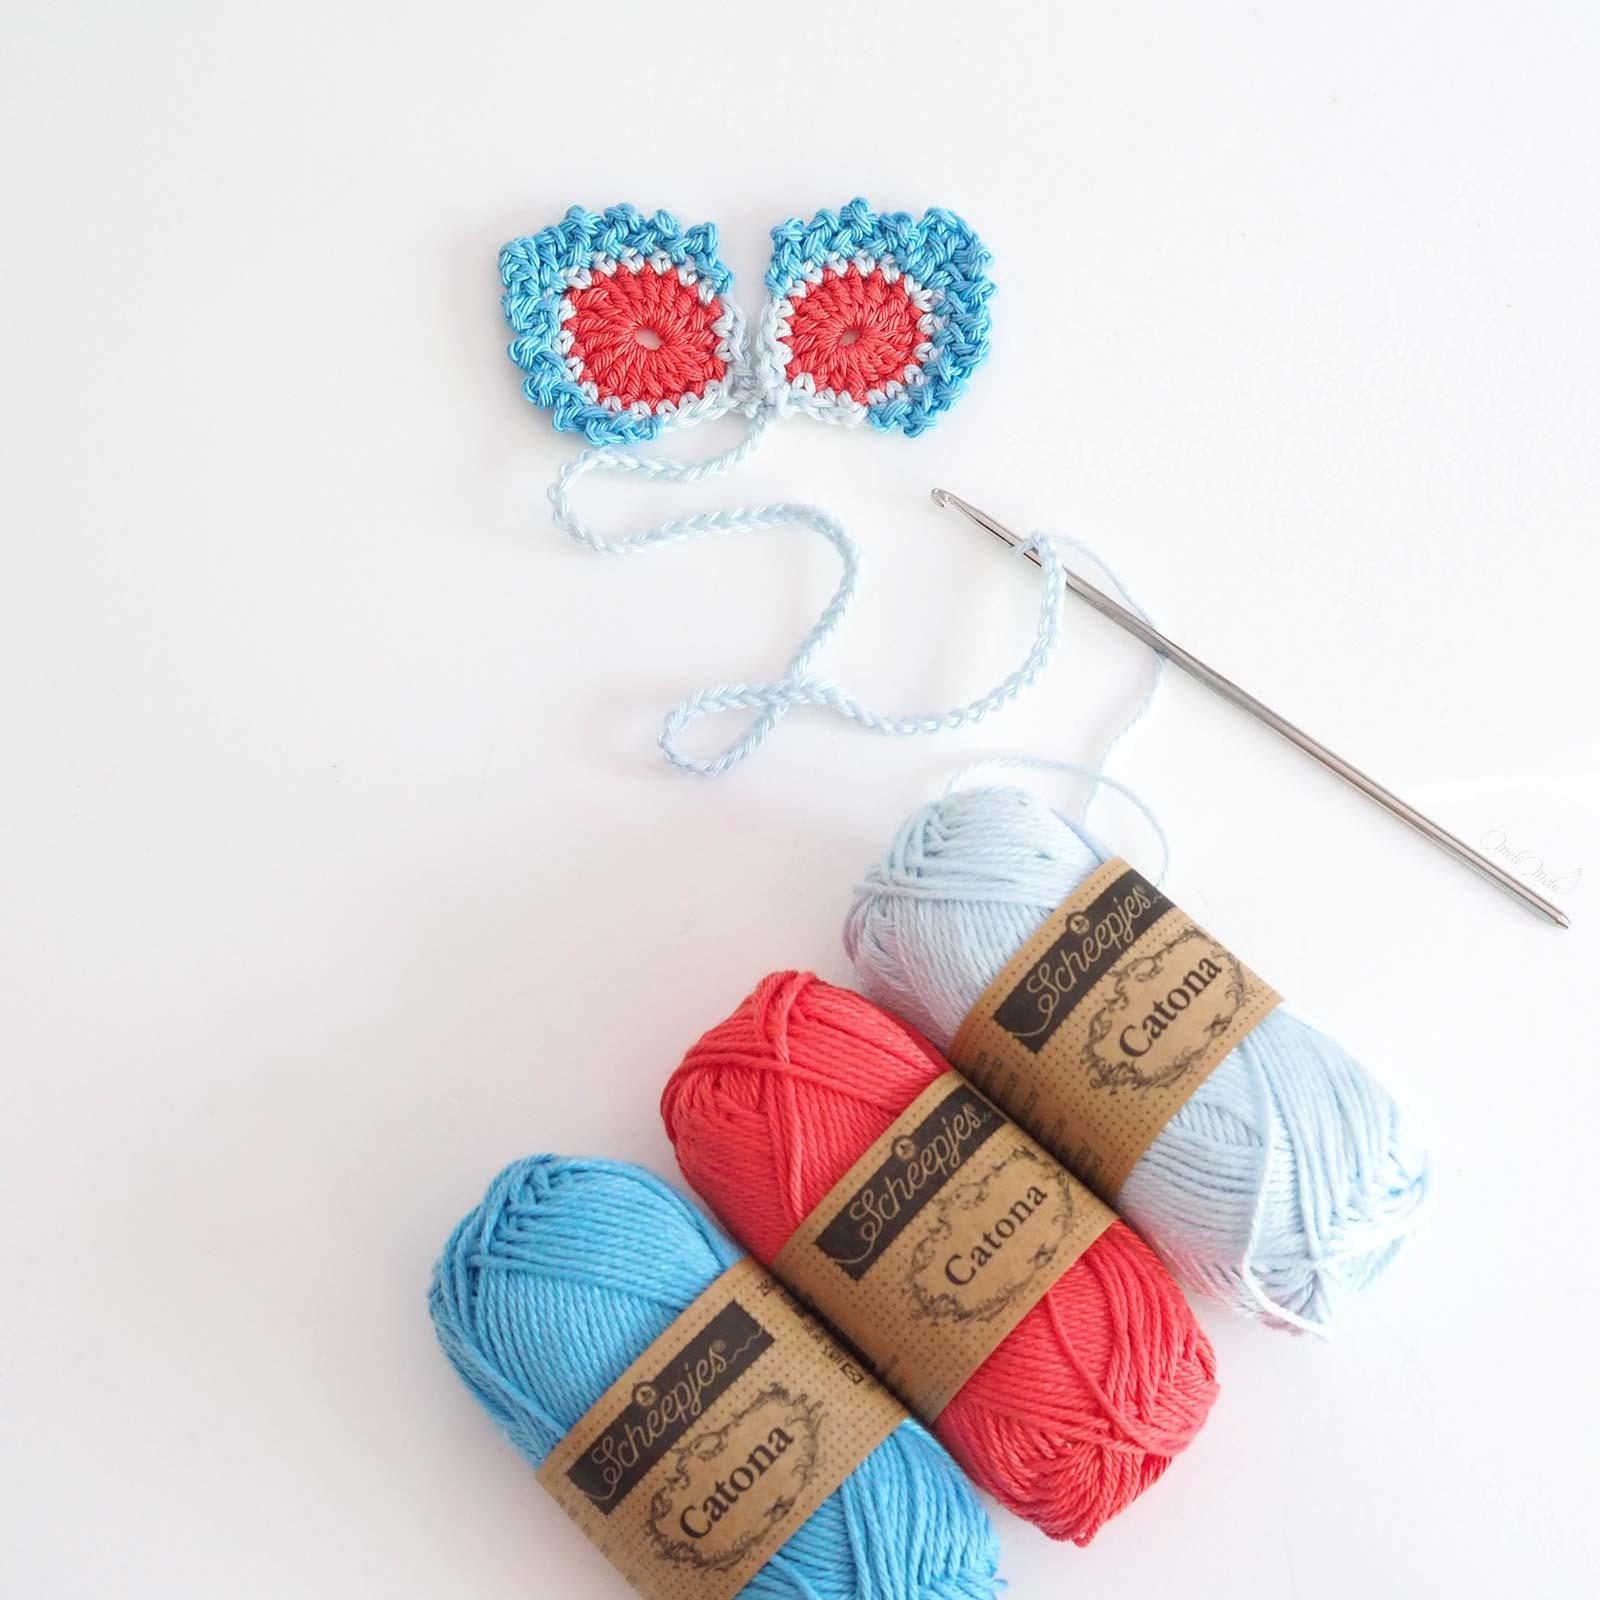 marque-pages wip double plume paon crochet coton laboutiquedemelimelo